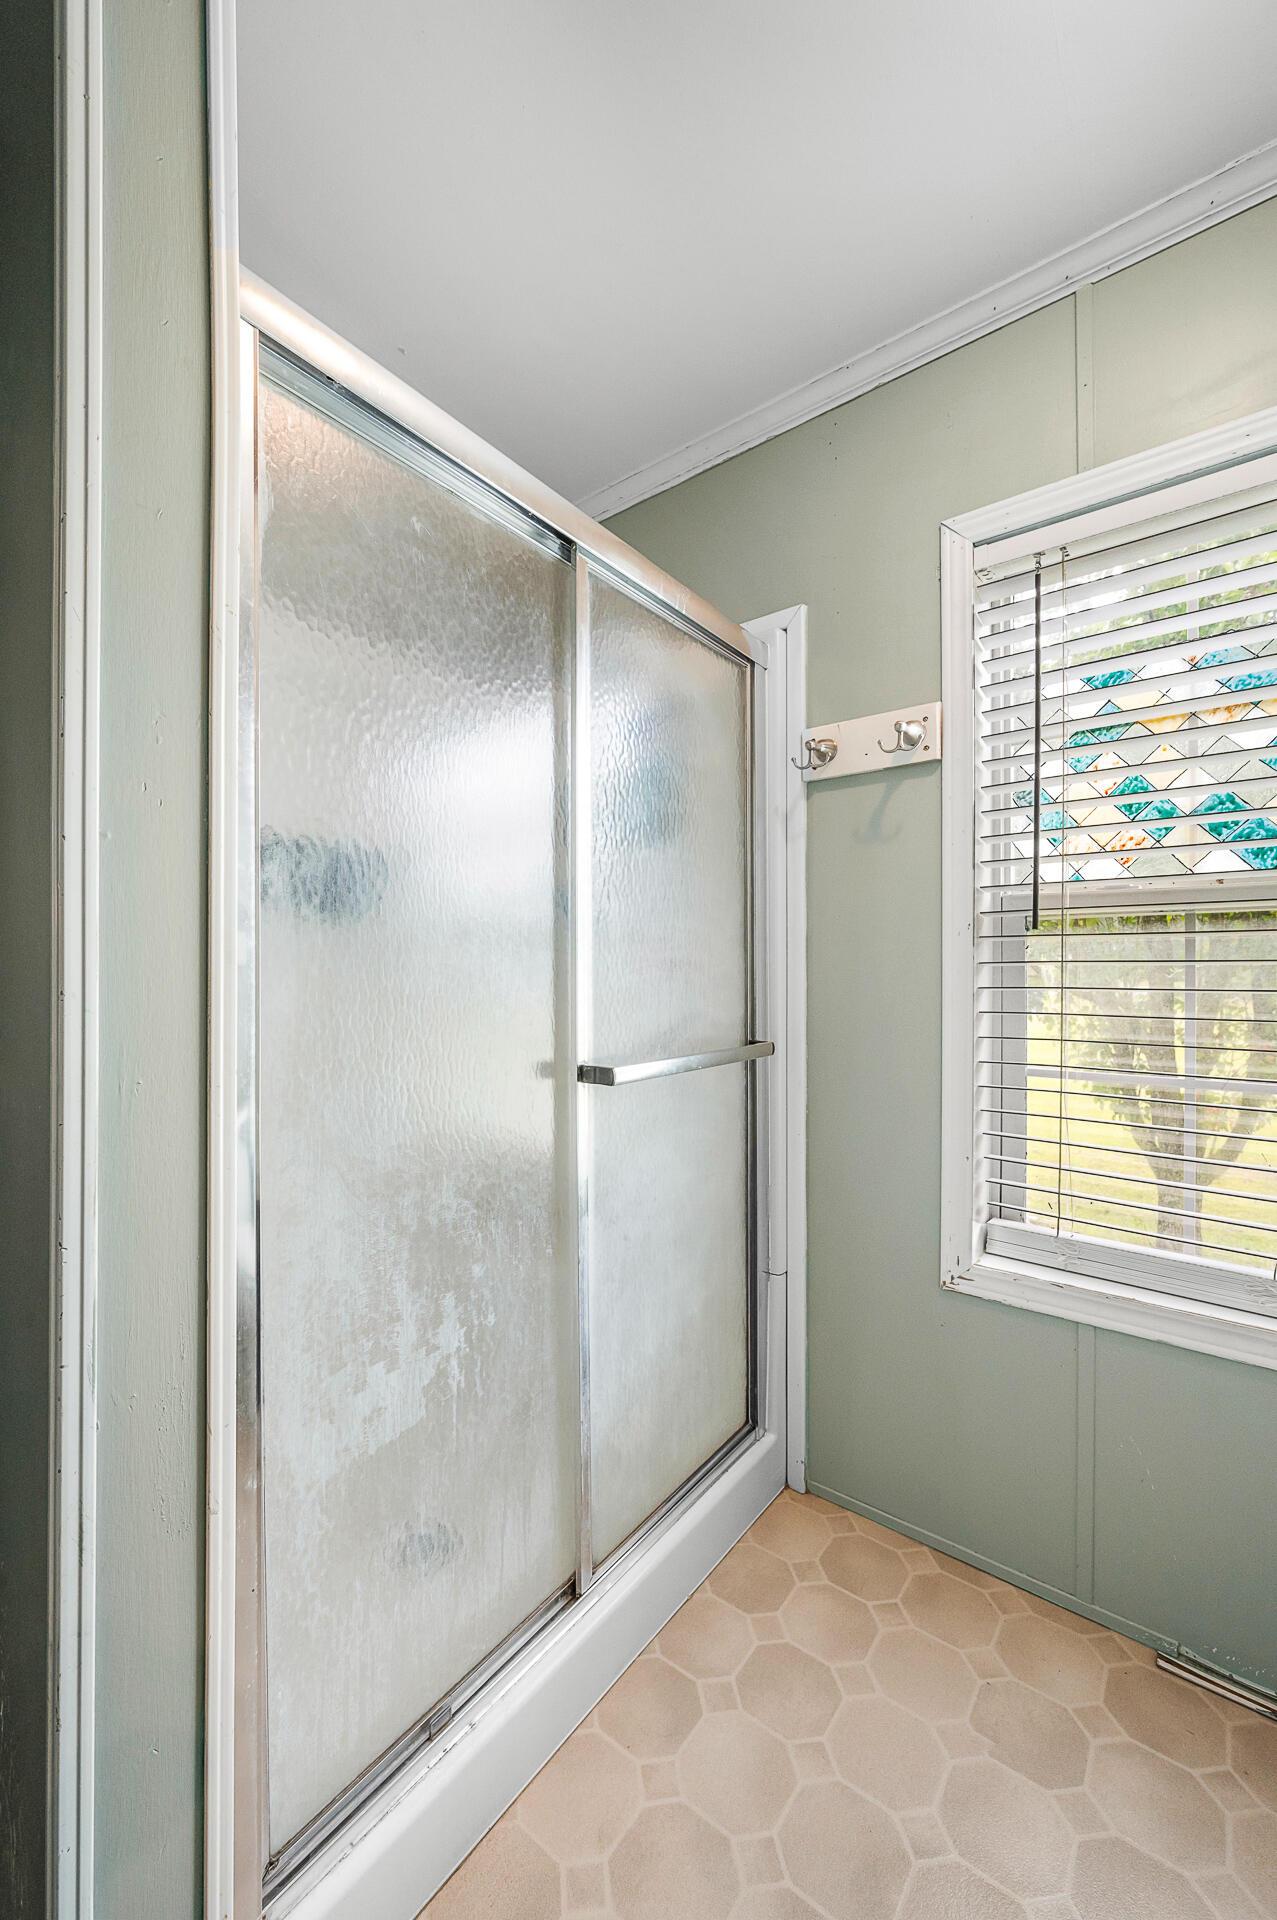 Clemson Terrace Homes For Sale - 250 Medina, Summerville, SC - 21